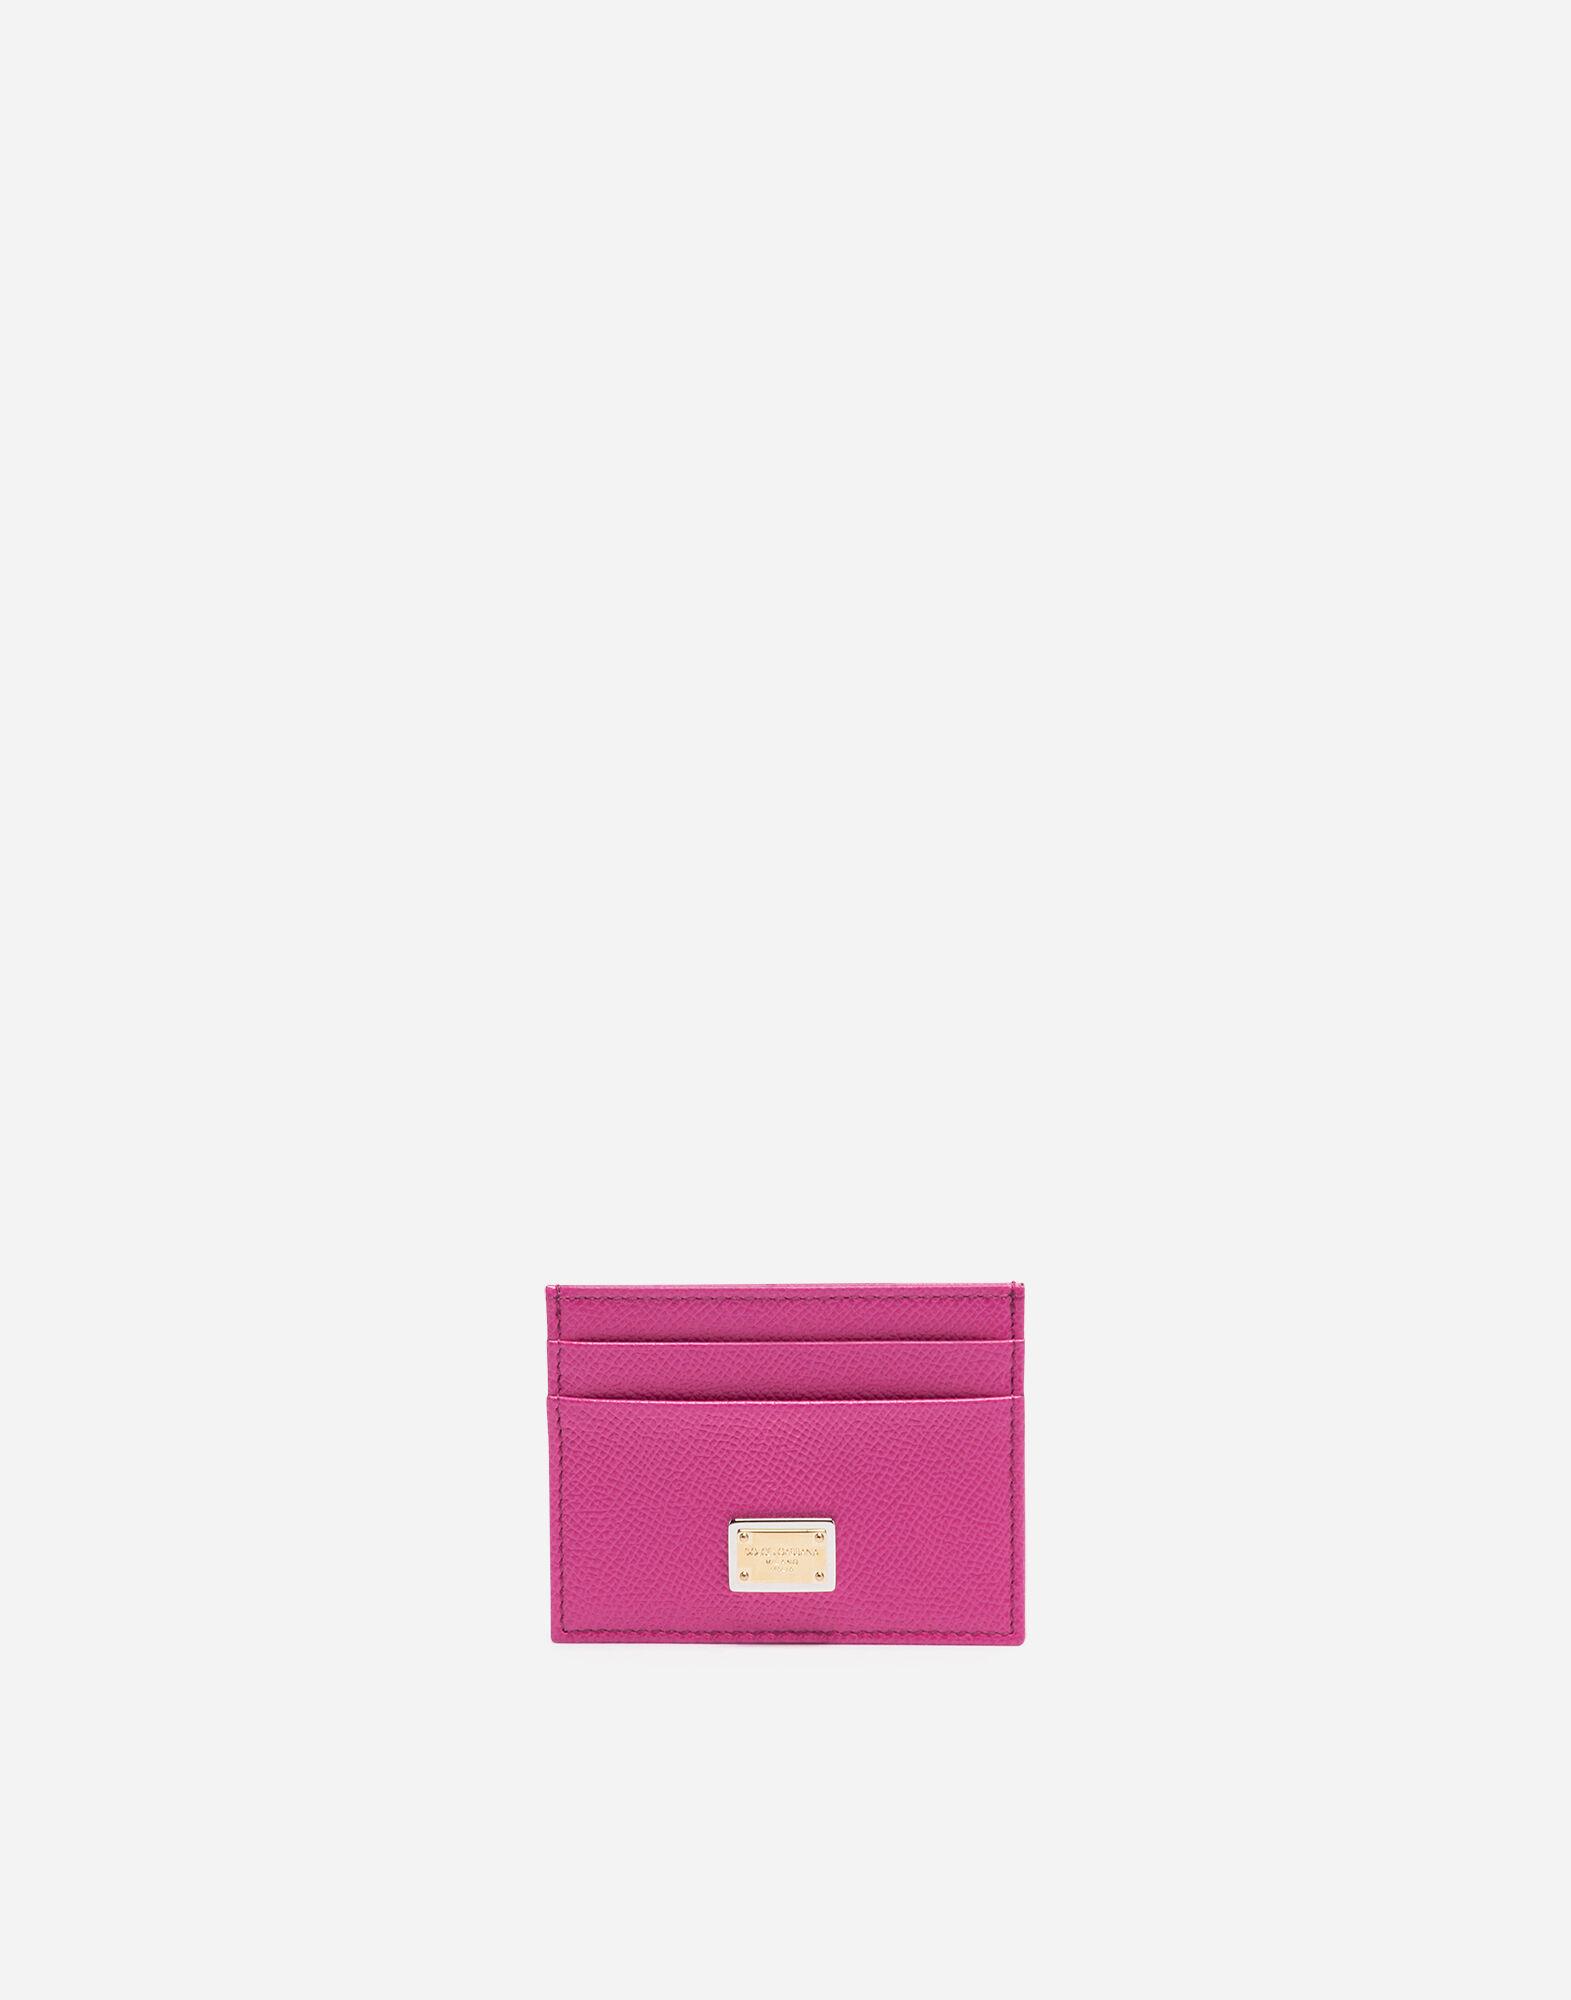 de 'dauphine' Titular Gabbana tarjeta Dolce de la qwPWPz08